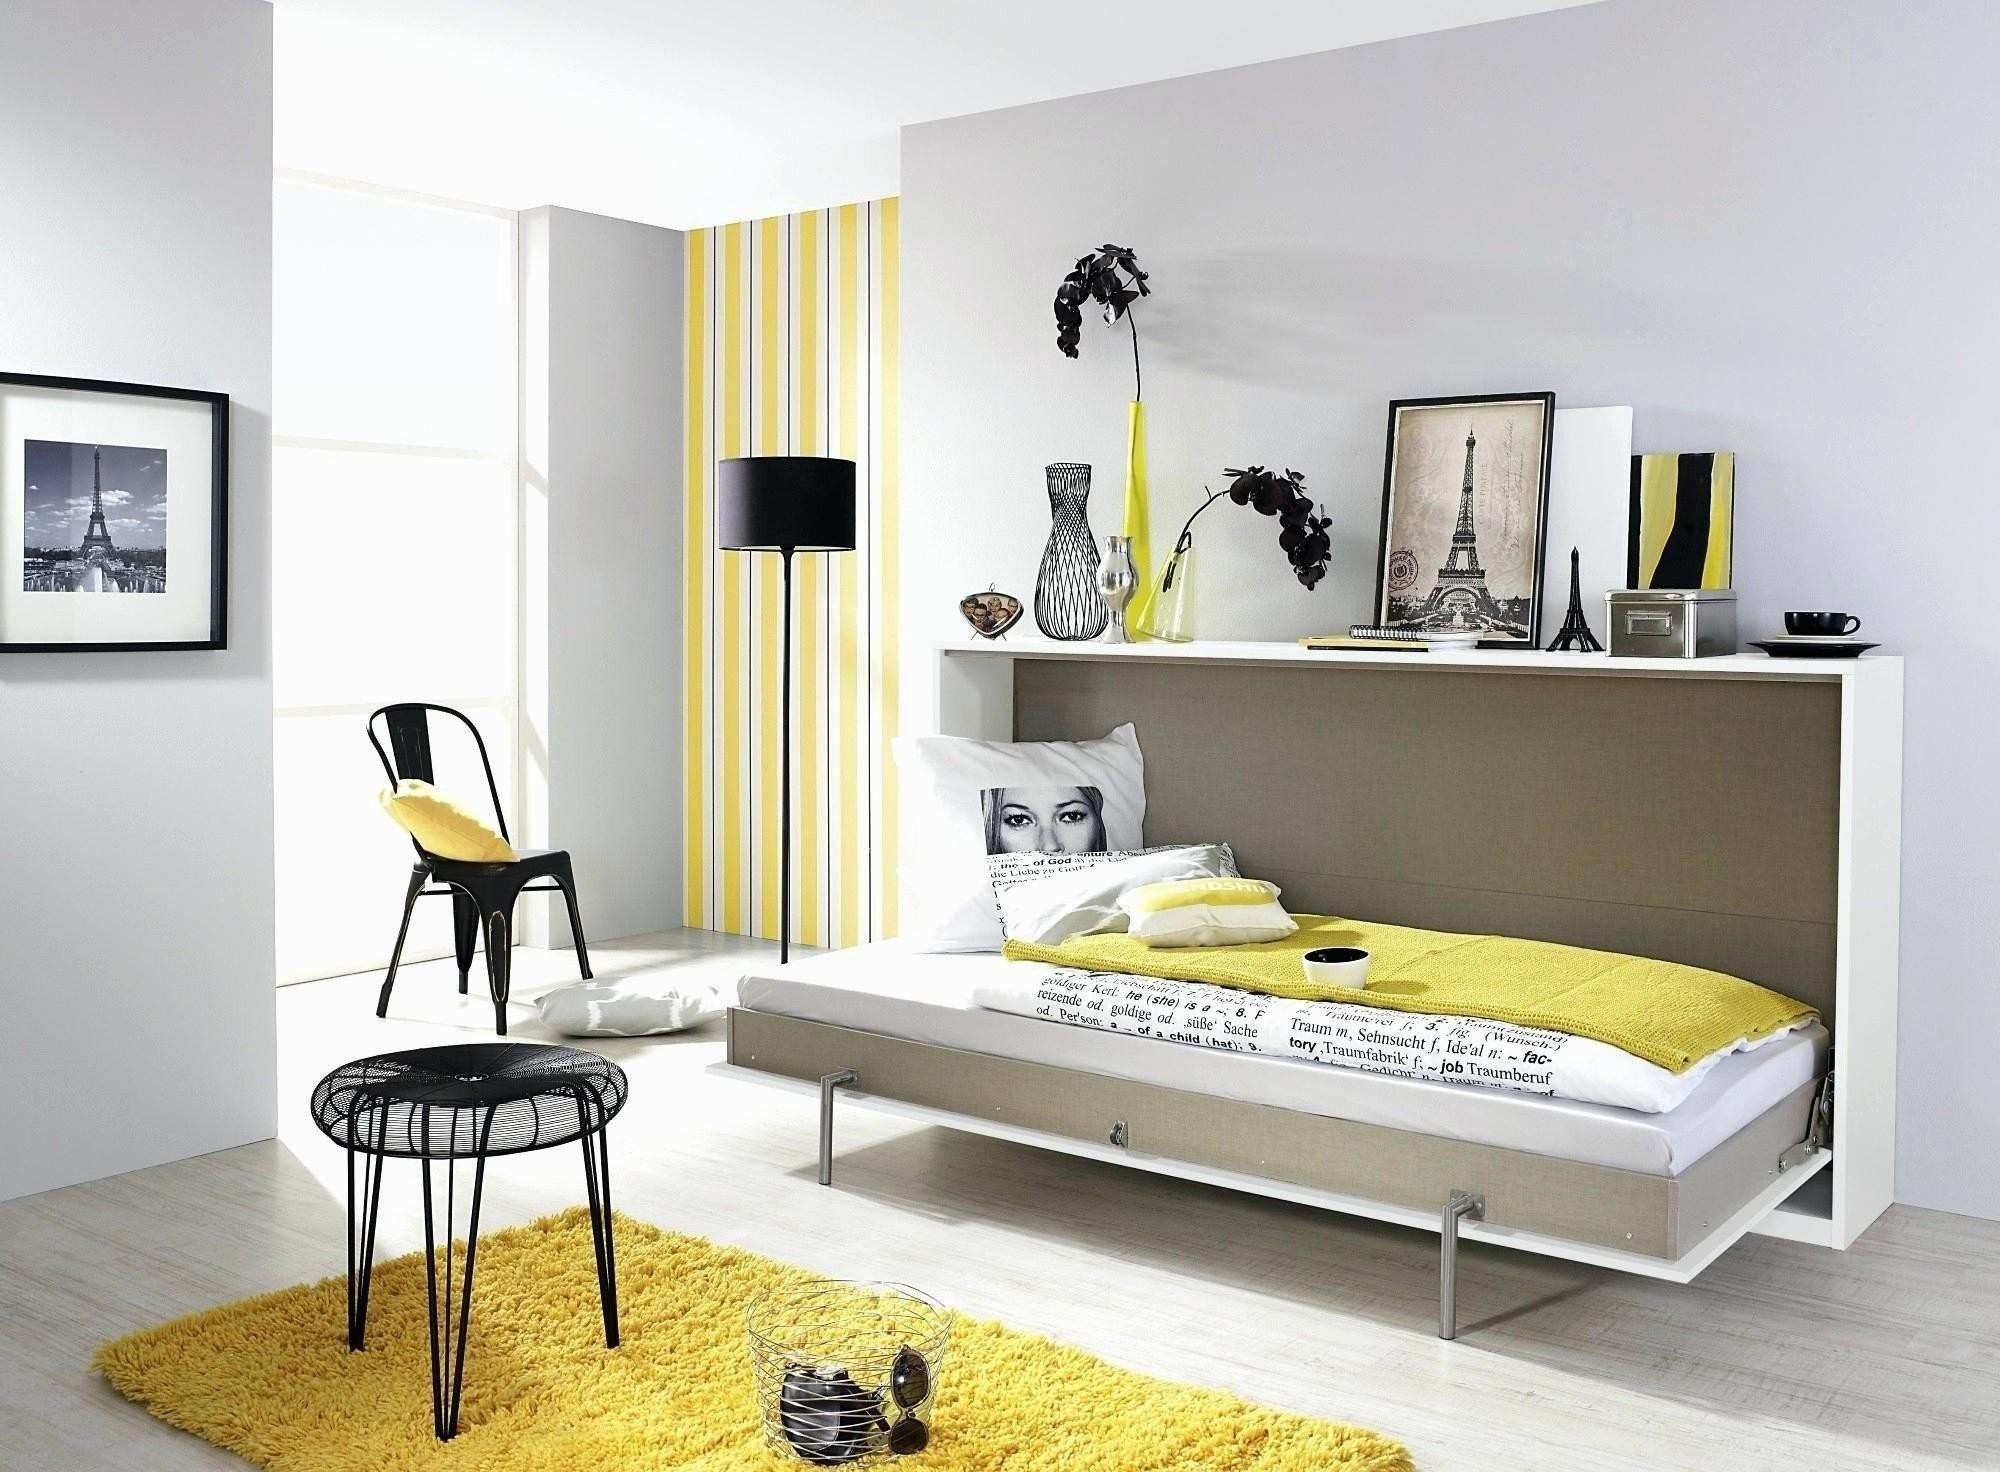 Lit Double Mezzanine Ikea Inspiré Lit Mezzanine Inspiré Bureau Double Ikea Beau Collection Lit